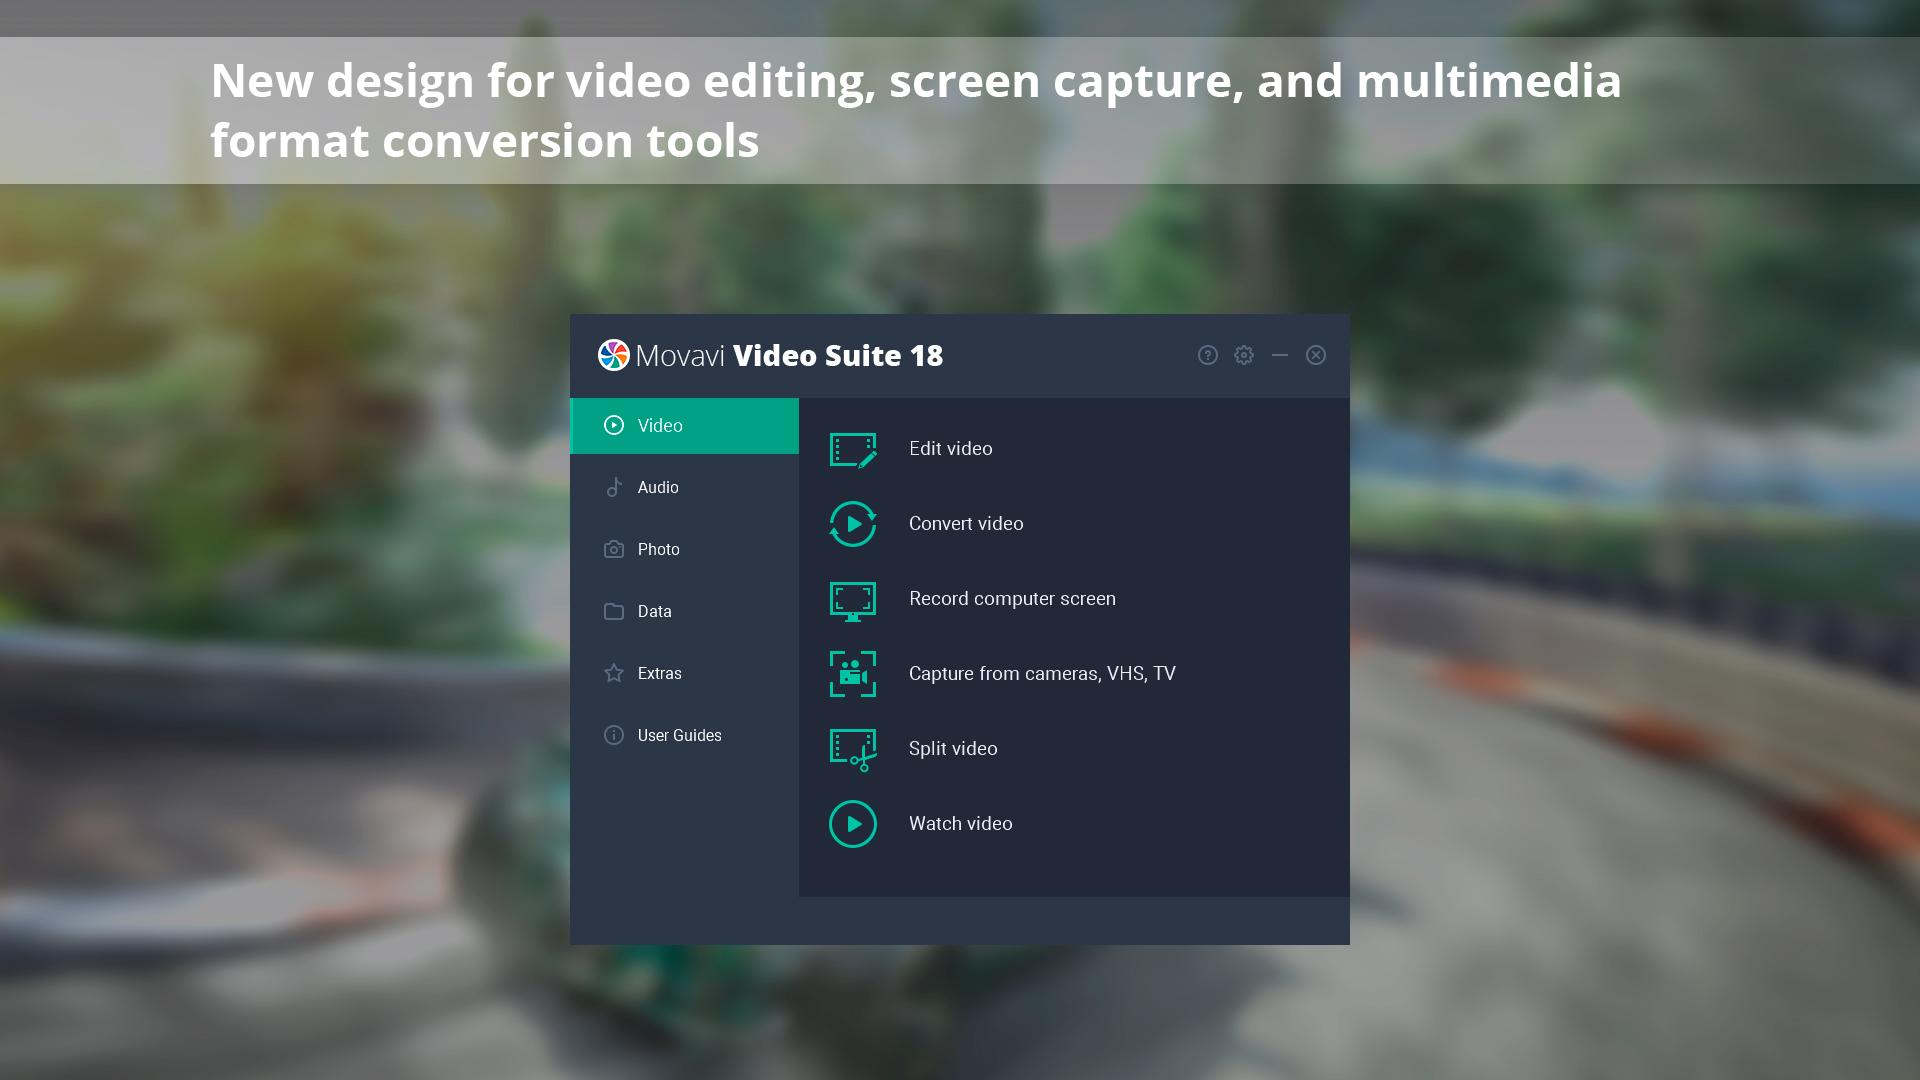 Movavi Video Suite 18 - Video Making Software - Edit, Convert, Capture Screen, and more screenshot